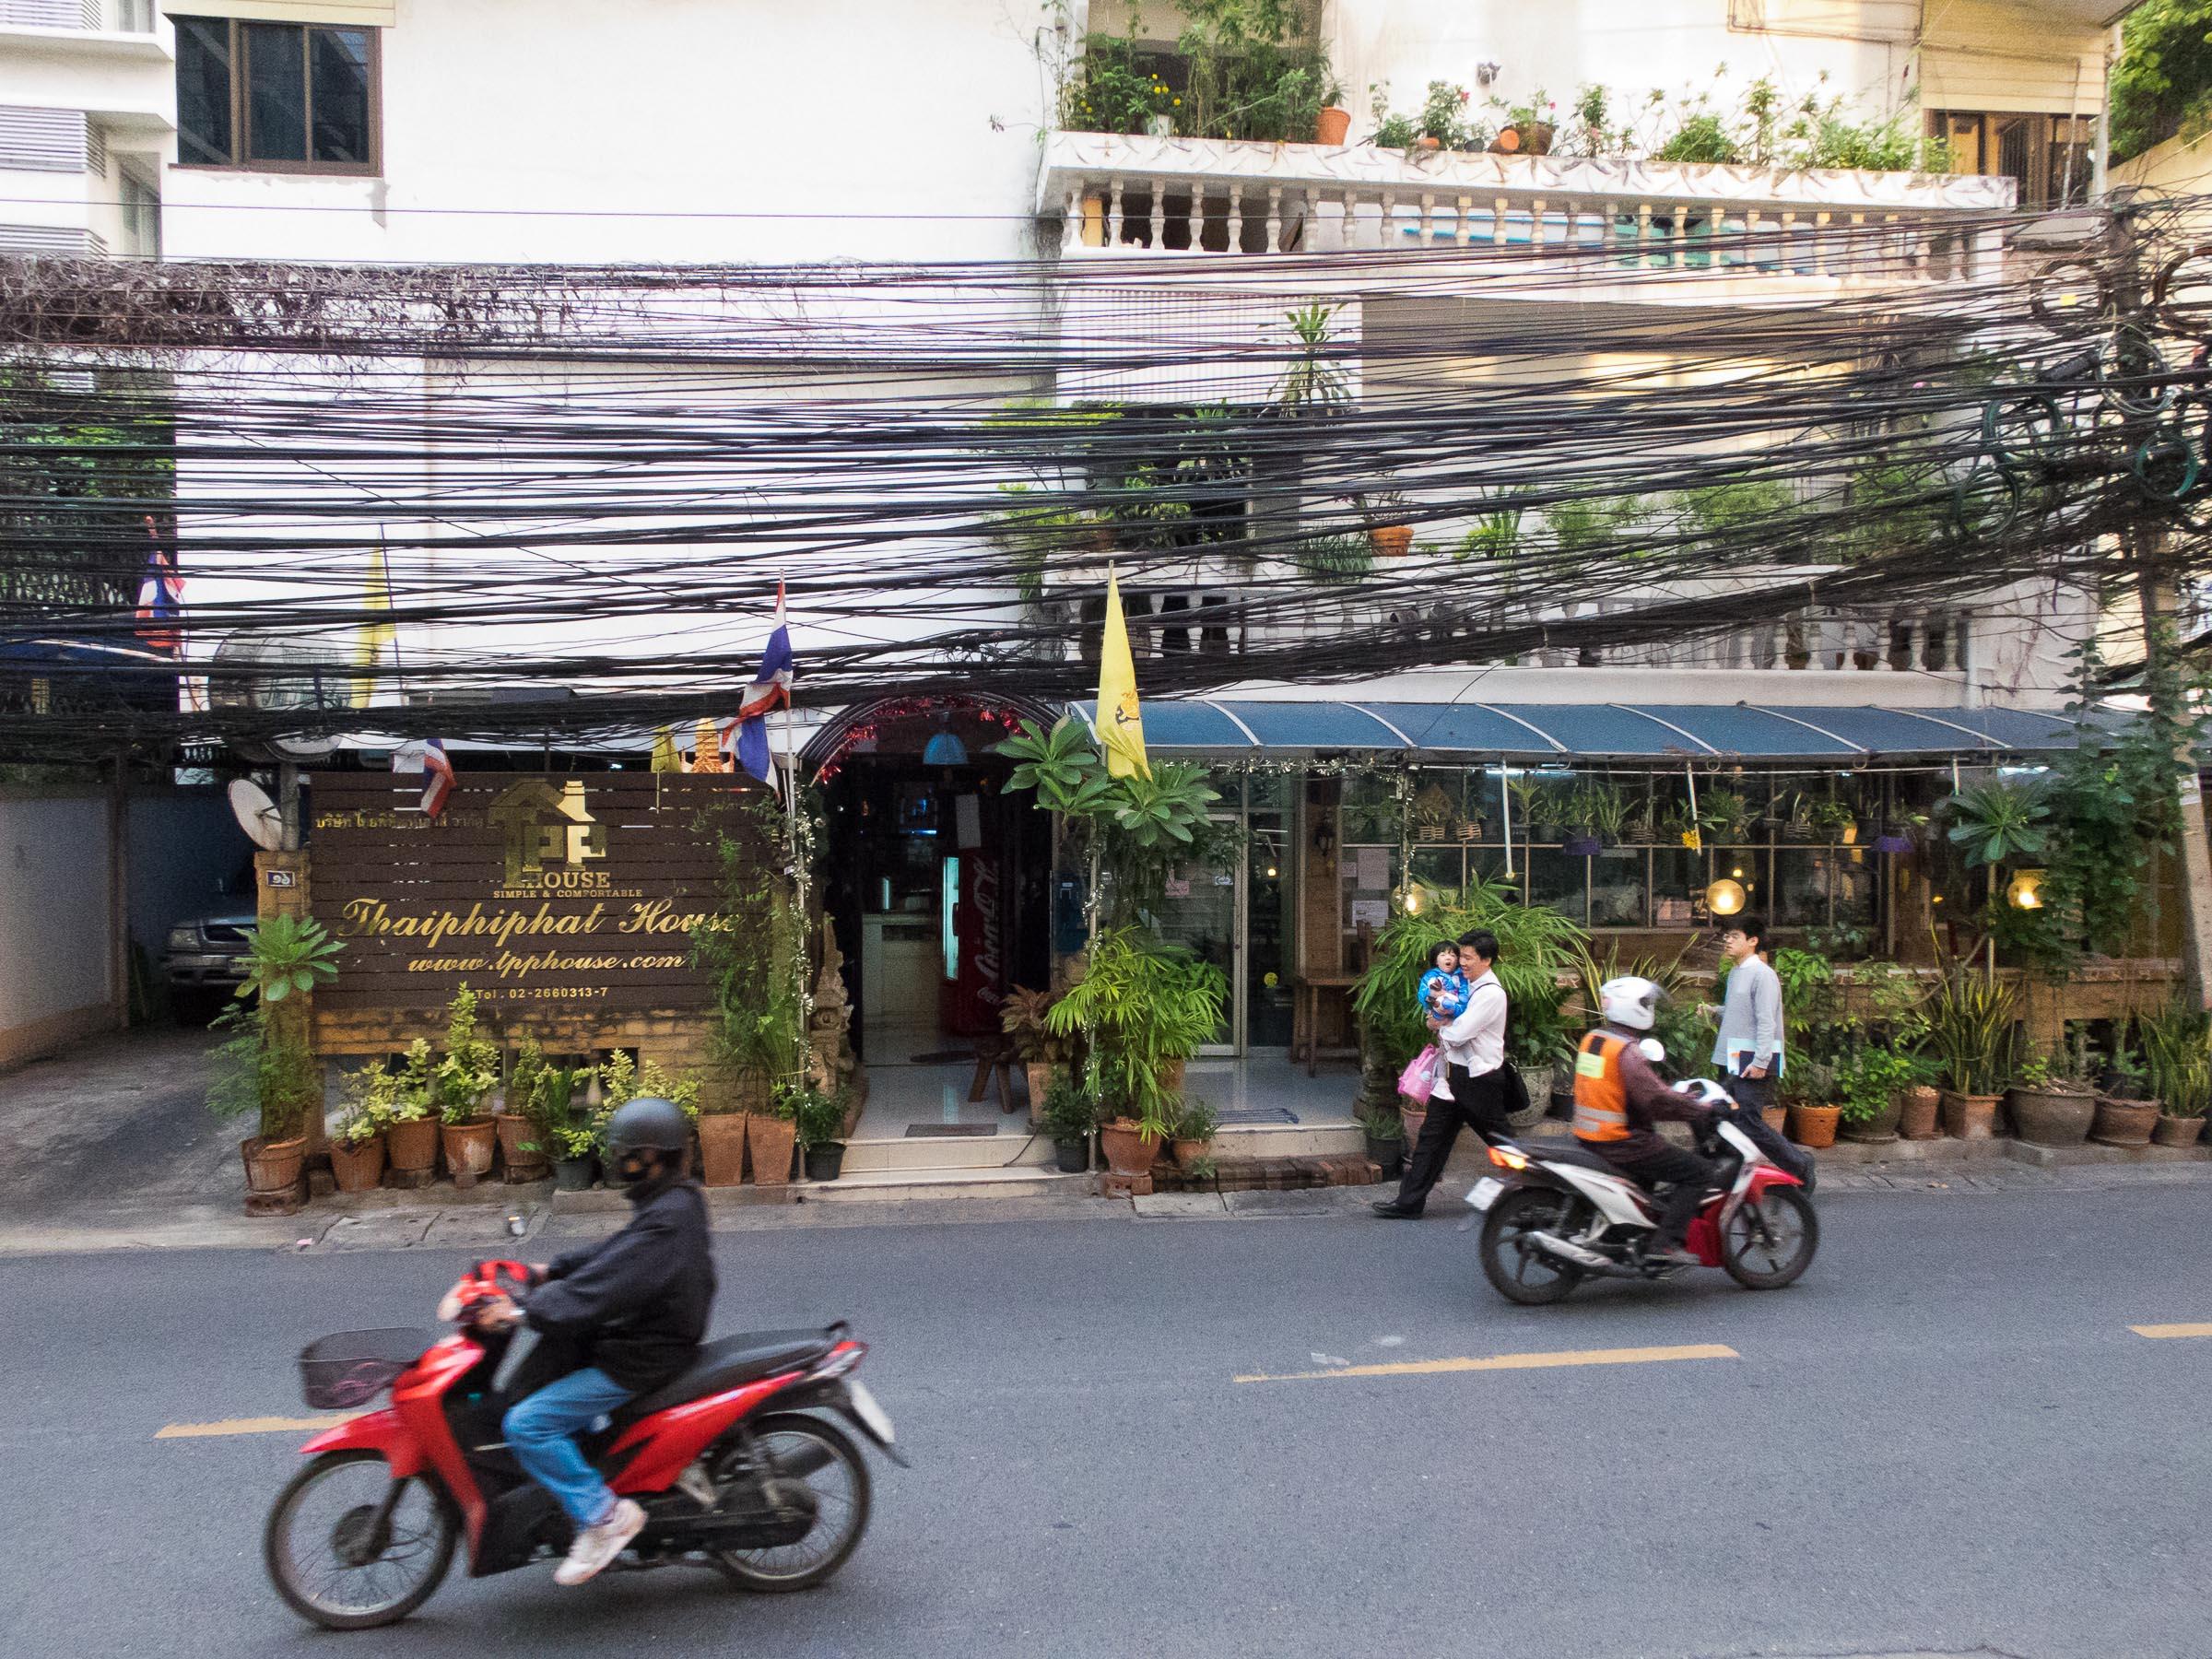 160125_Bangkok_105